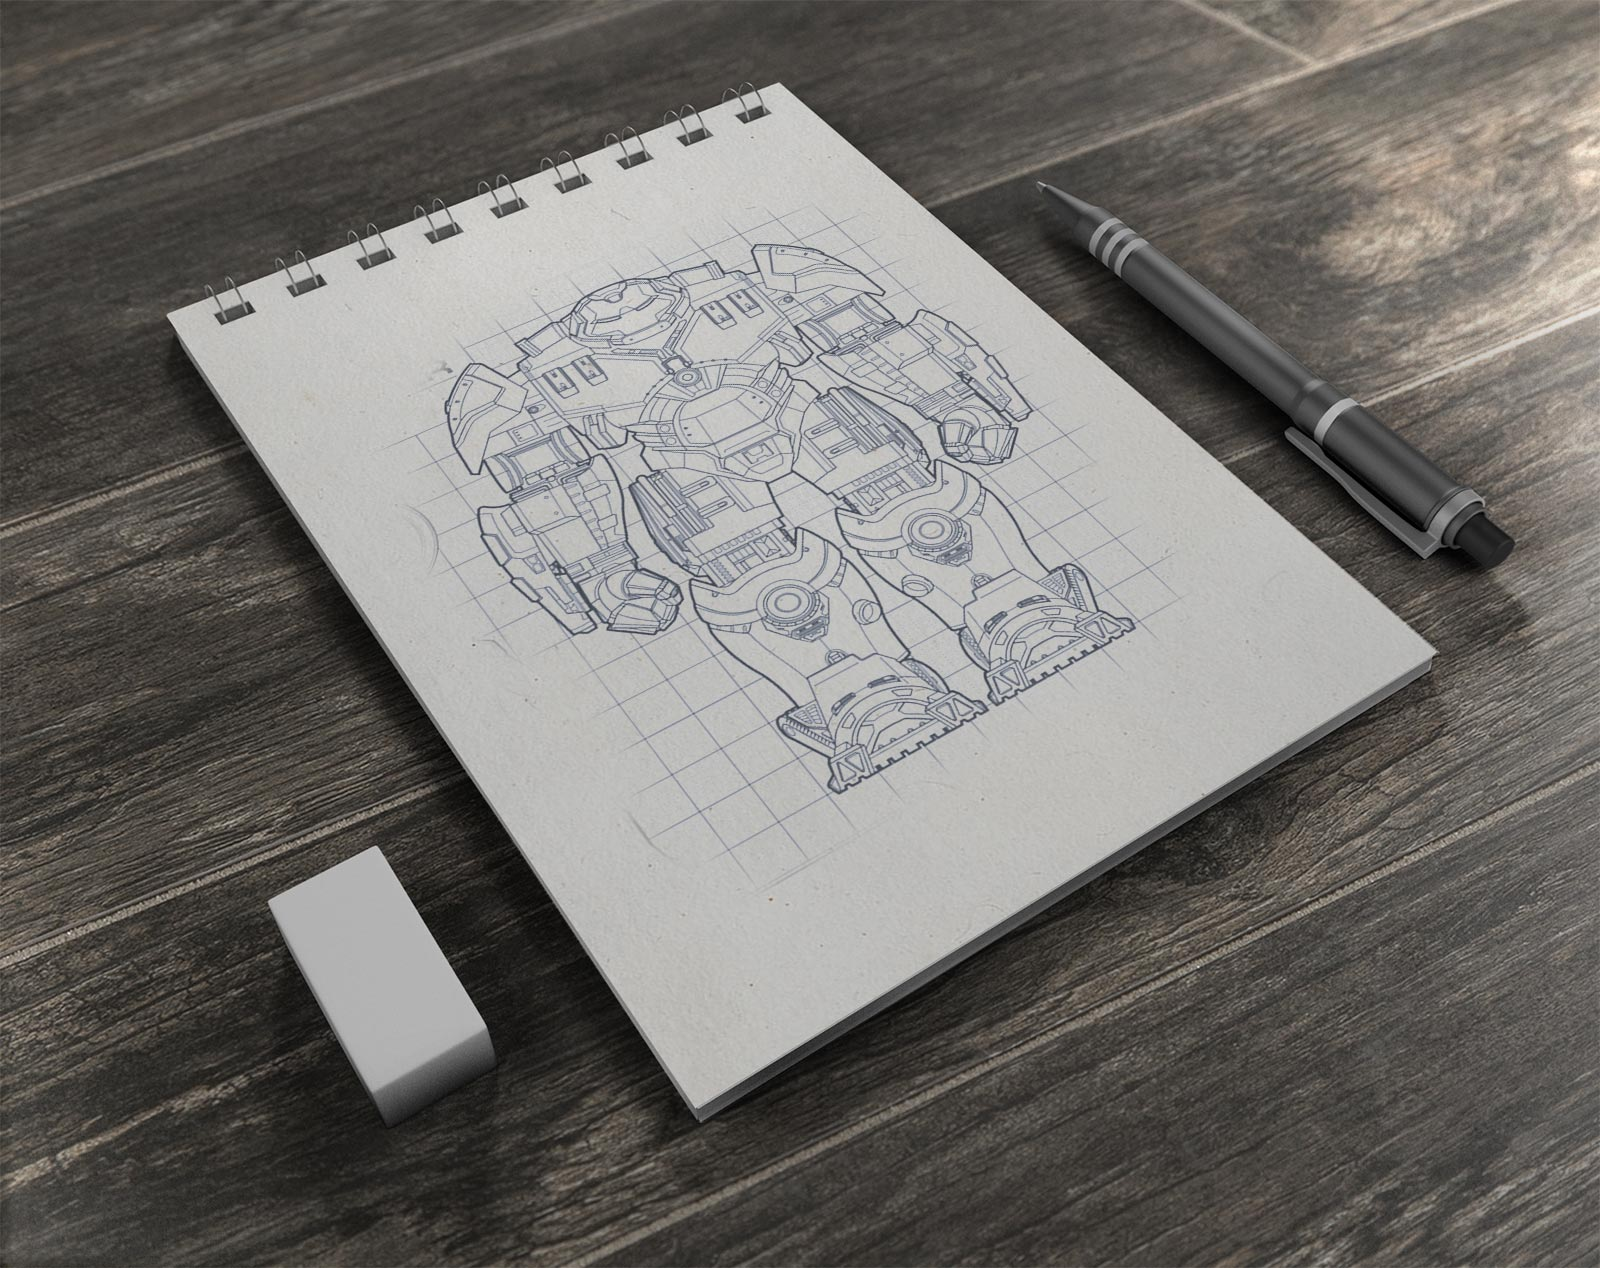 Free Illustrations / Drawing Sketchbook Mockup PSD - Good